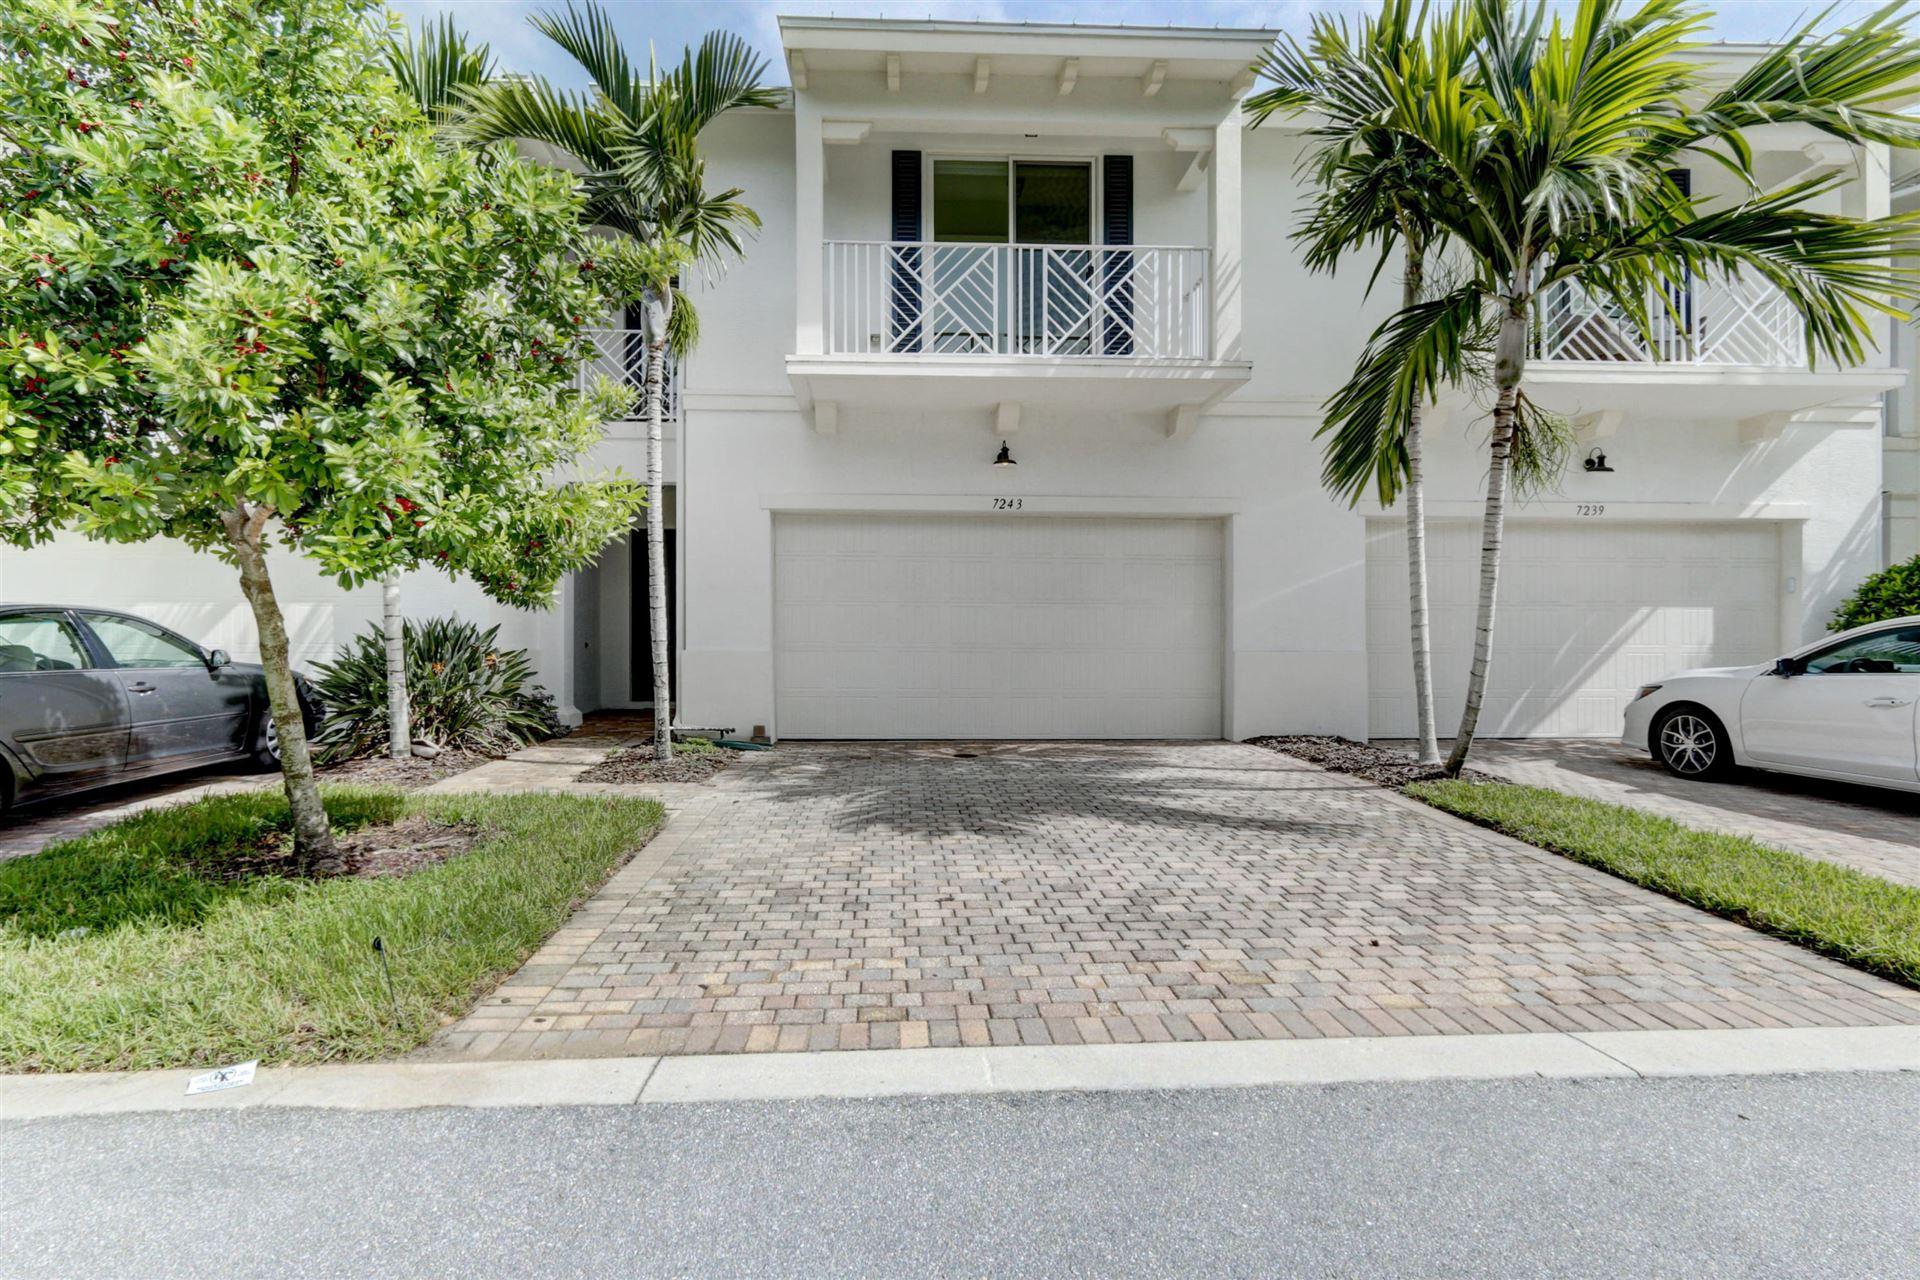 7243 Oxford Court, Palm Beach Gardens, FL 33418 - #: RX-10652669